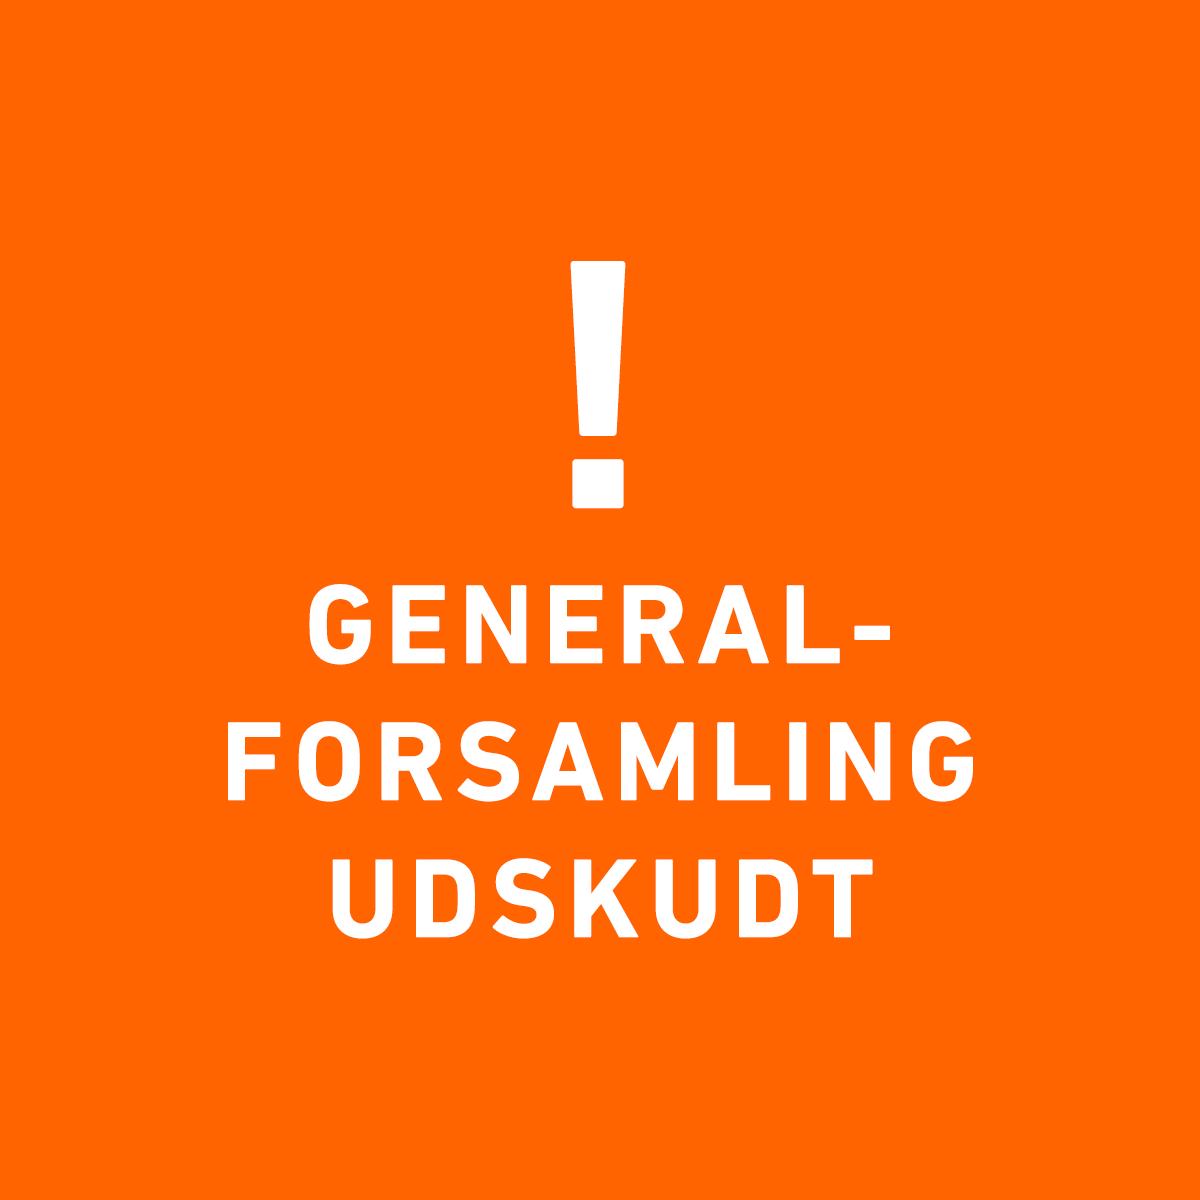 kv21_generalforsamlingudskudt